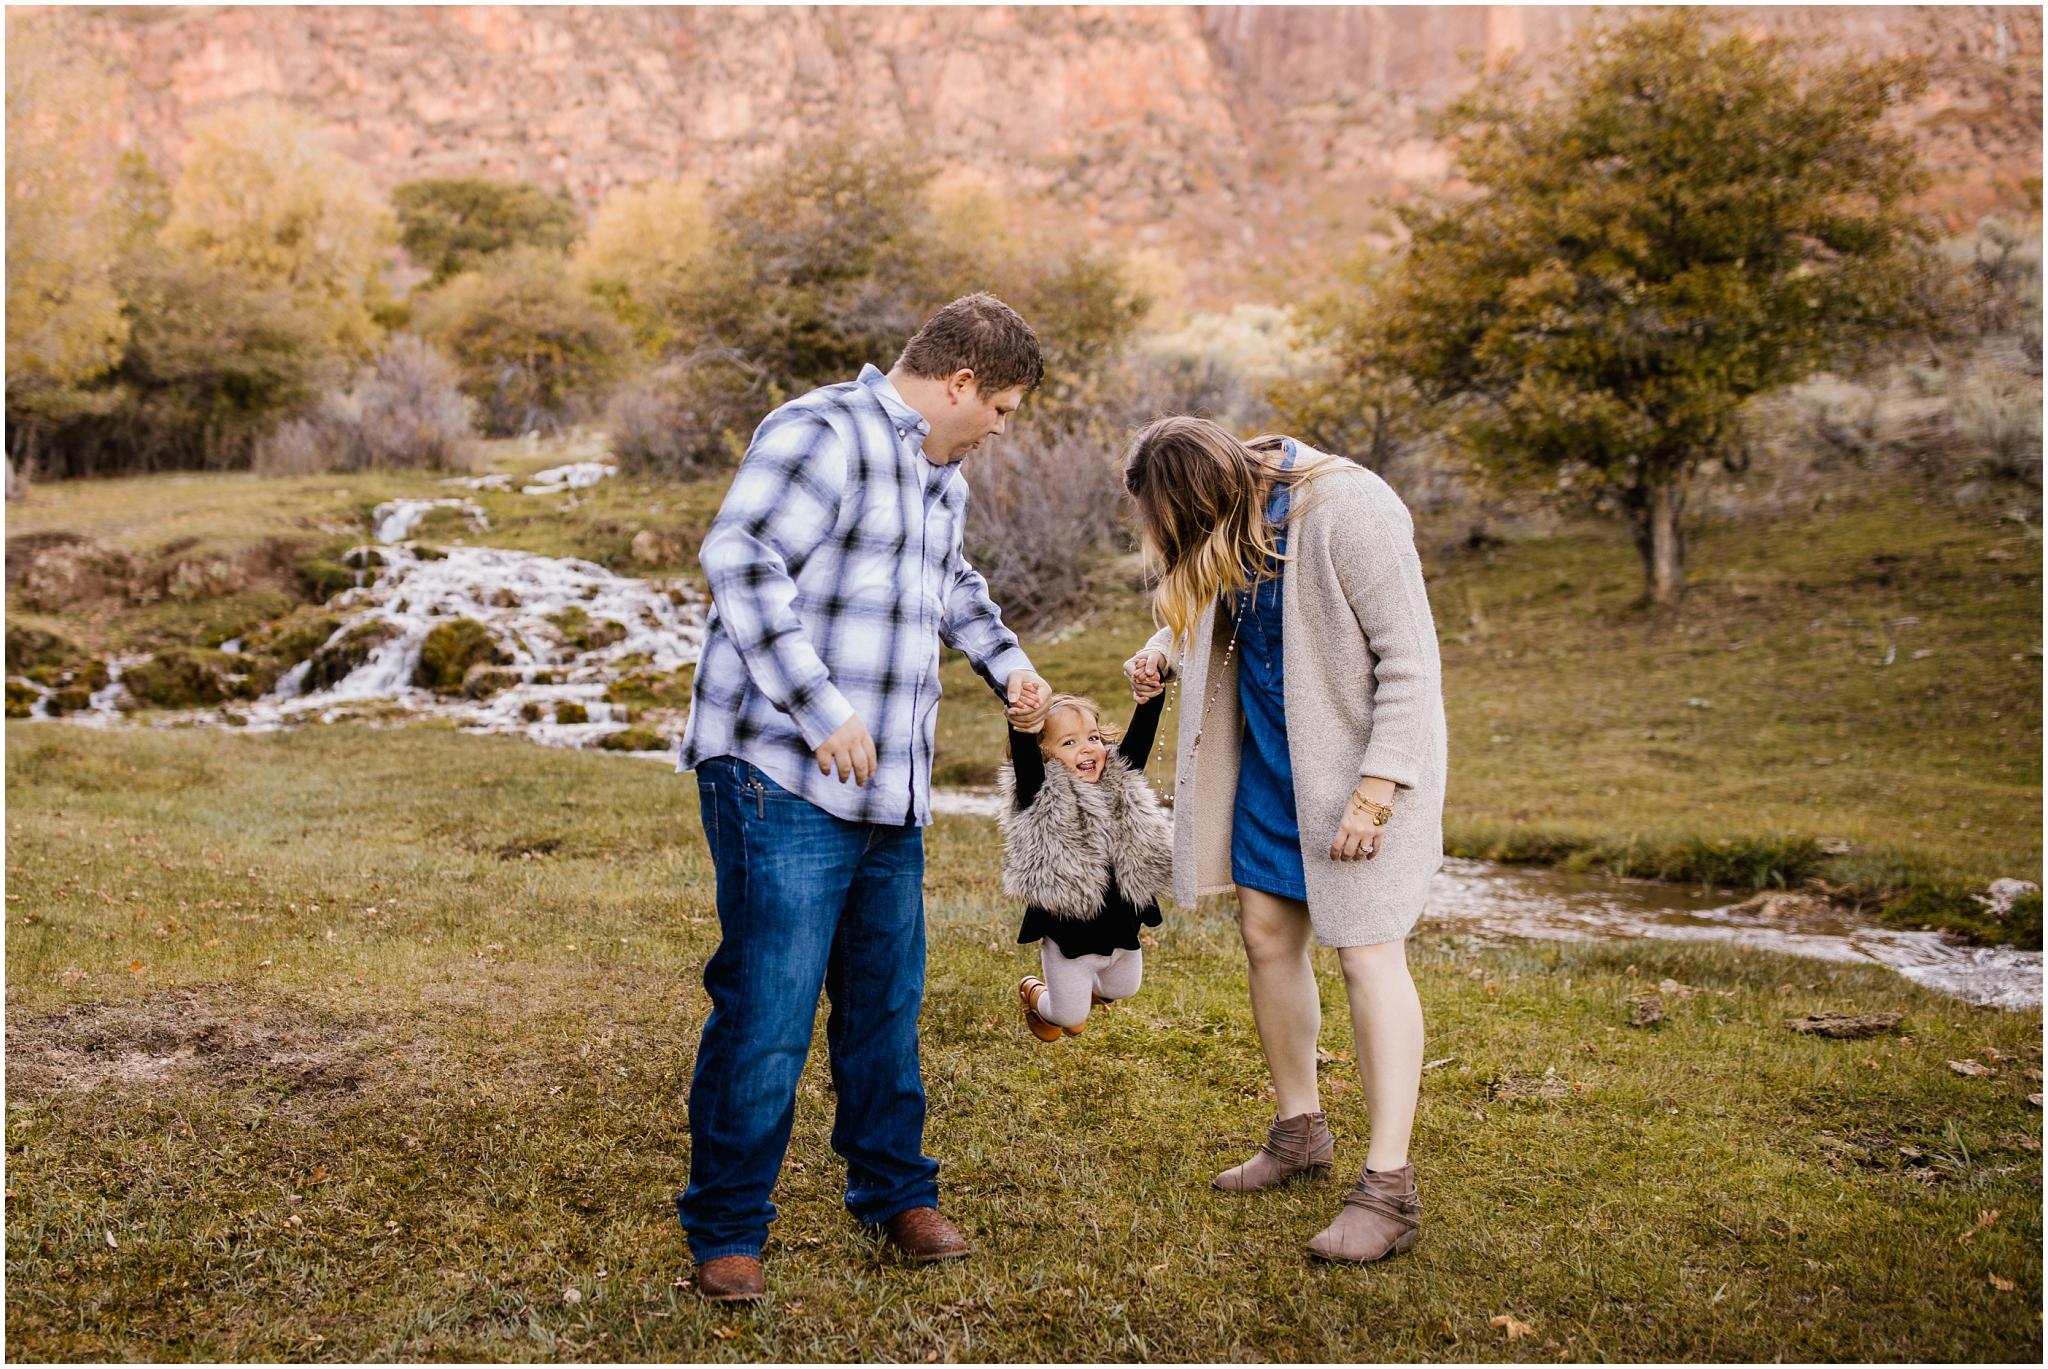 Frandsen-39_Lizzie-B-Imagery-Utah-Family-Photographer-Utah-County-Central-Utah-Park-City-Salt-Lake-City.jpg